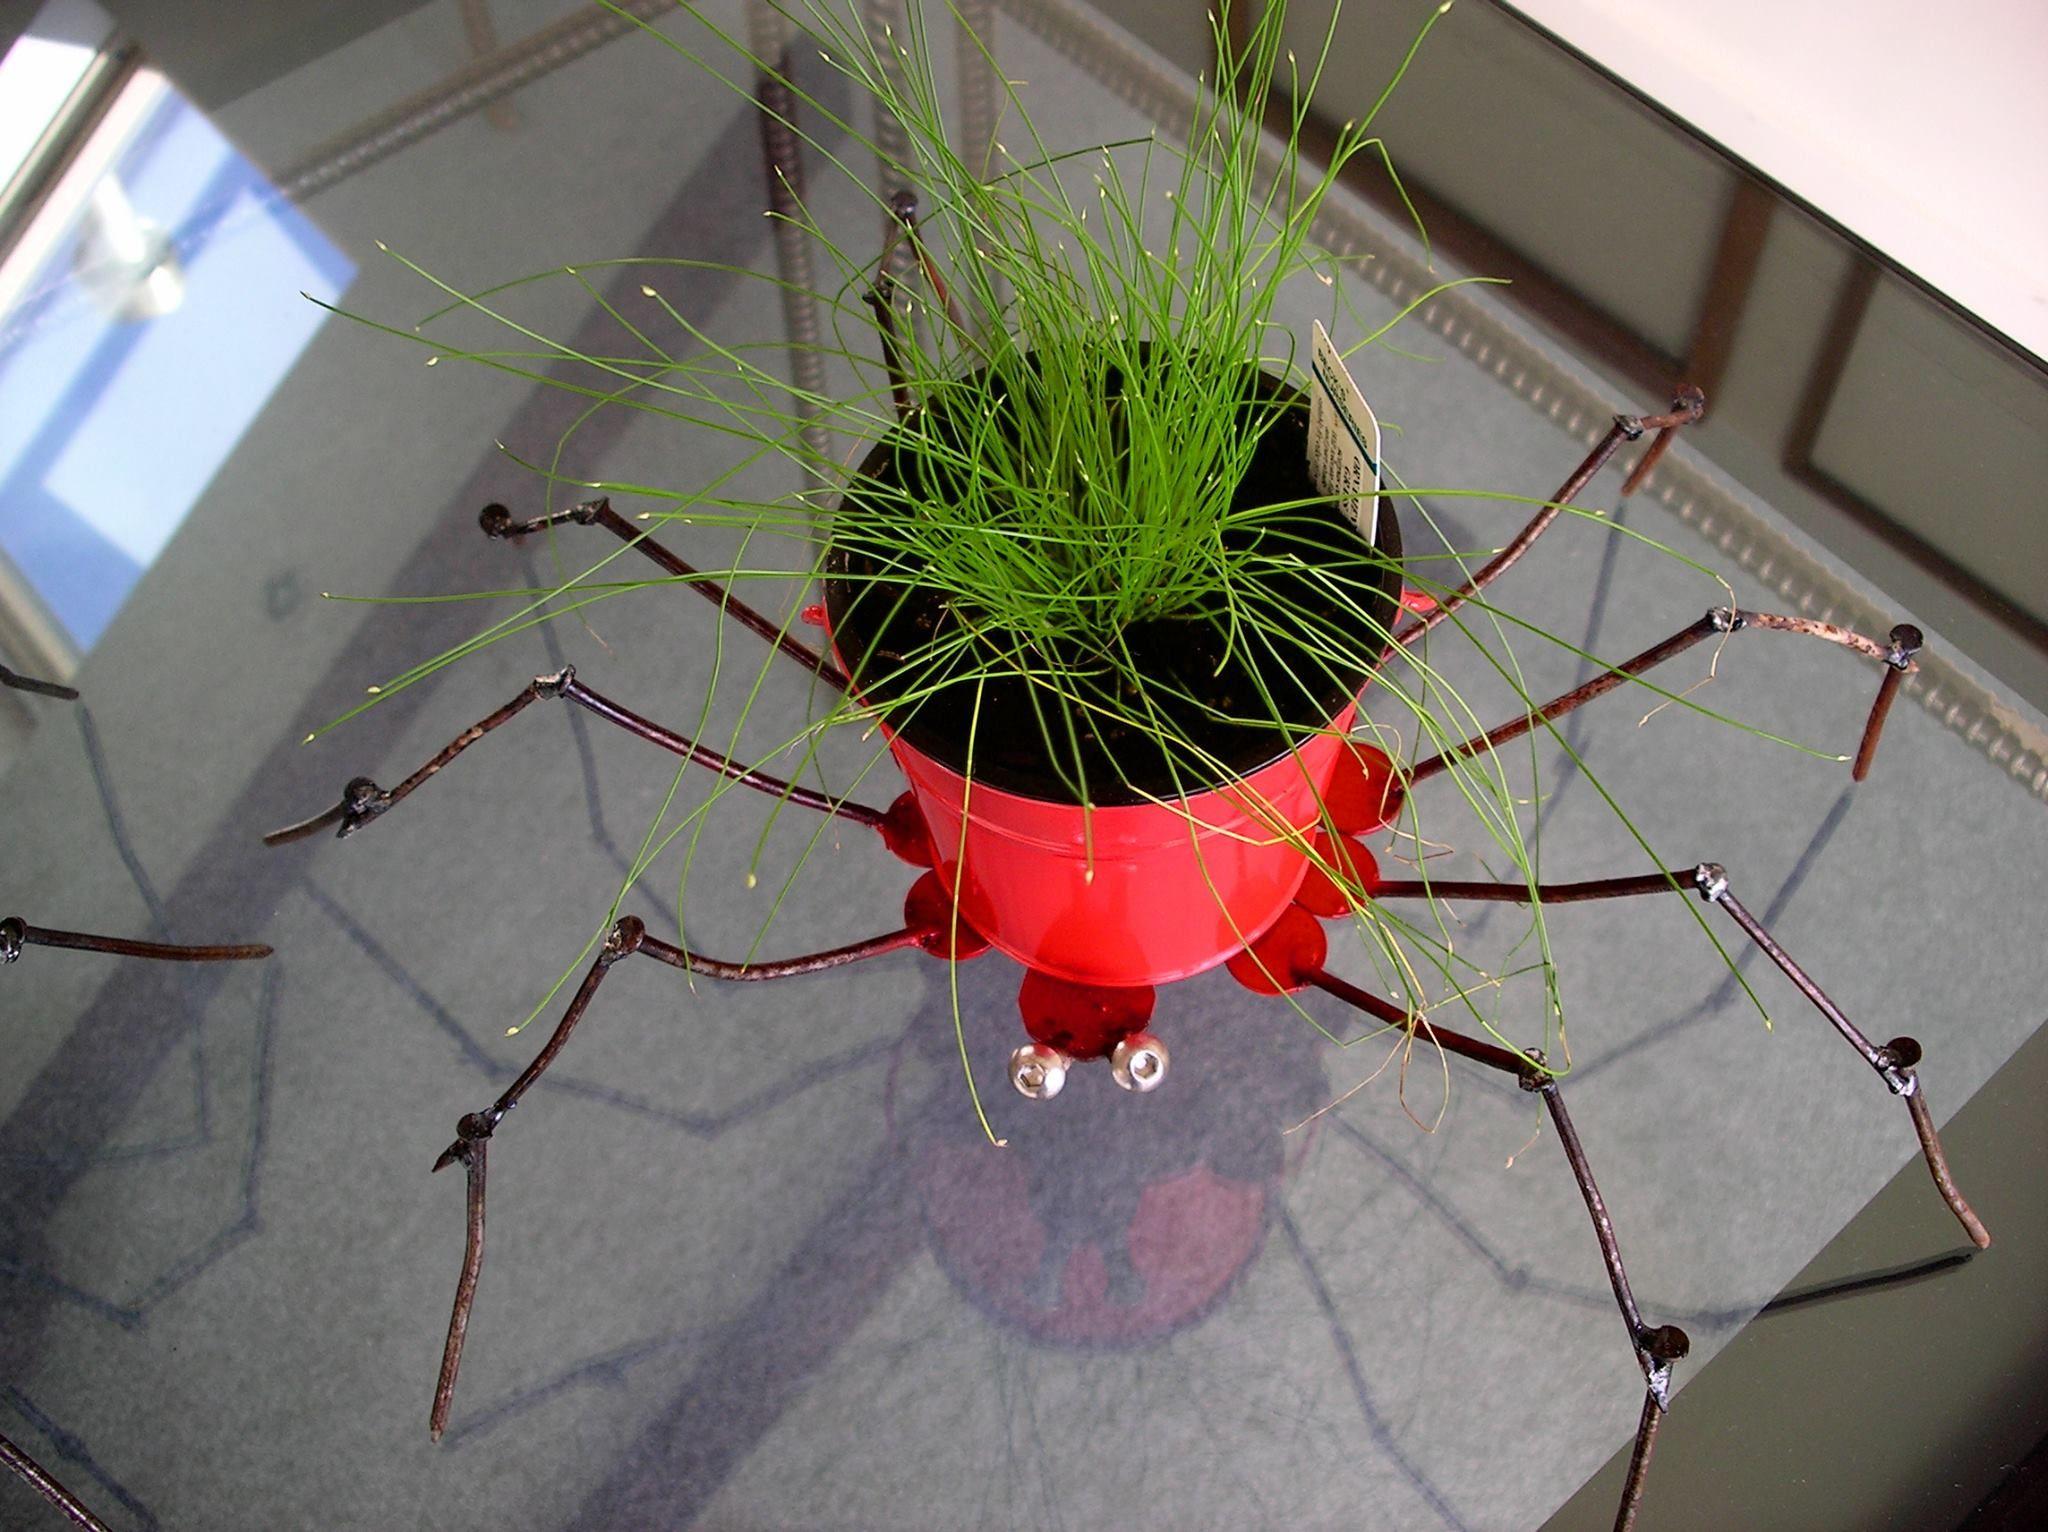 potplant holder made of nails and scrap metal